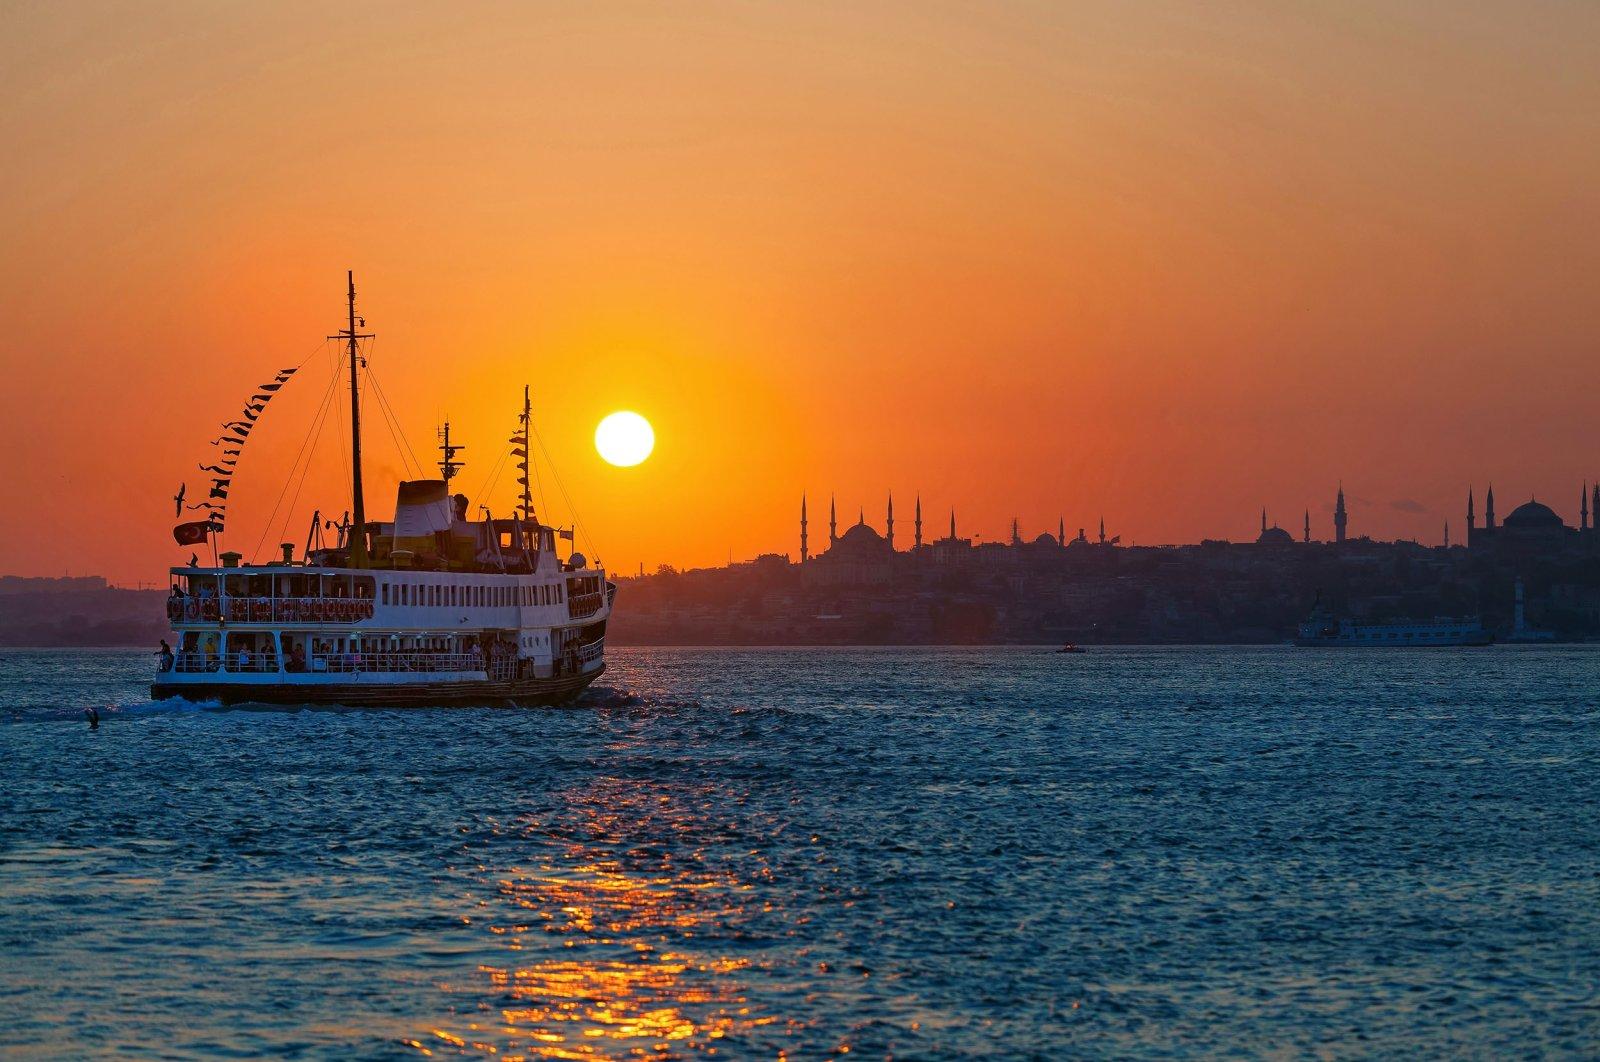 Passenger ferry floats across the Bosporus at sunset, Istanbul, Turkey. (Shutterstock Photo)